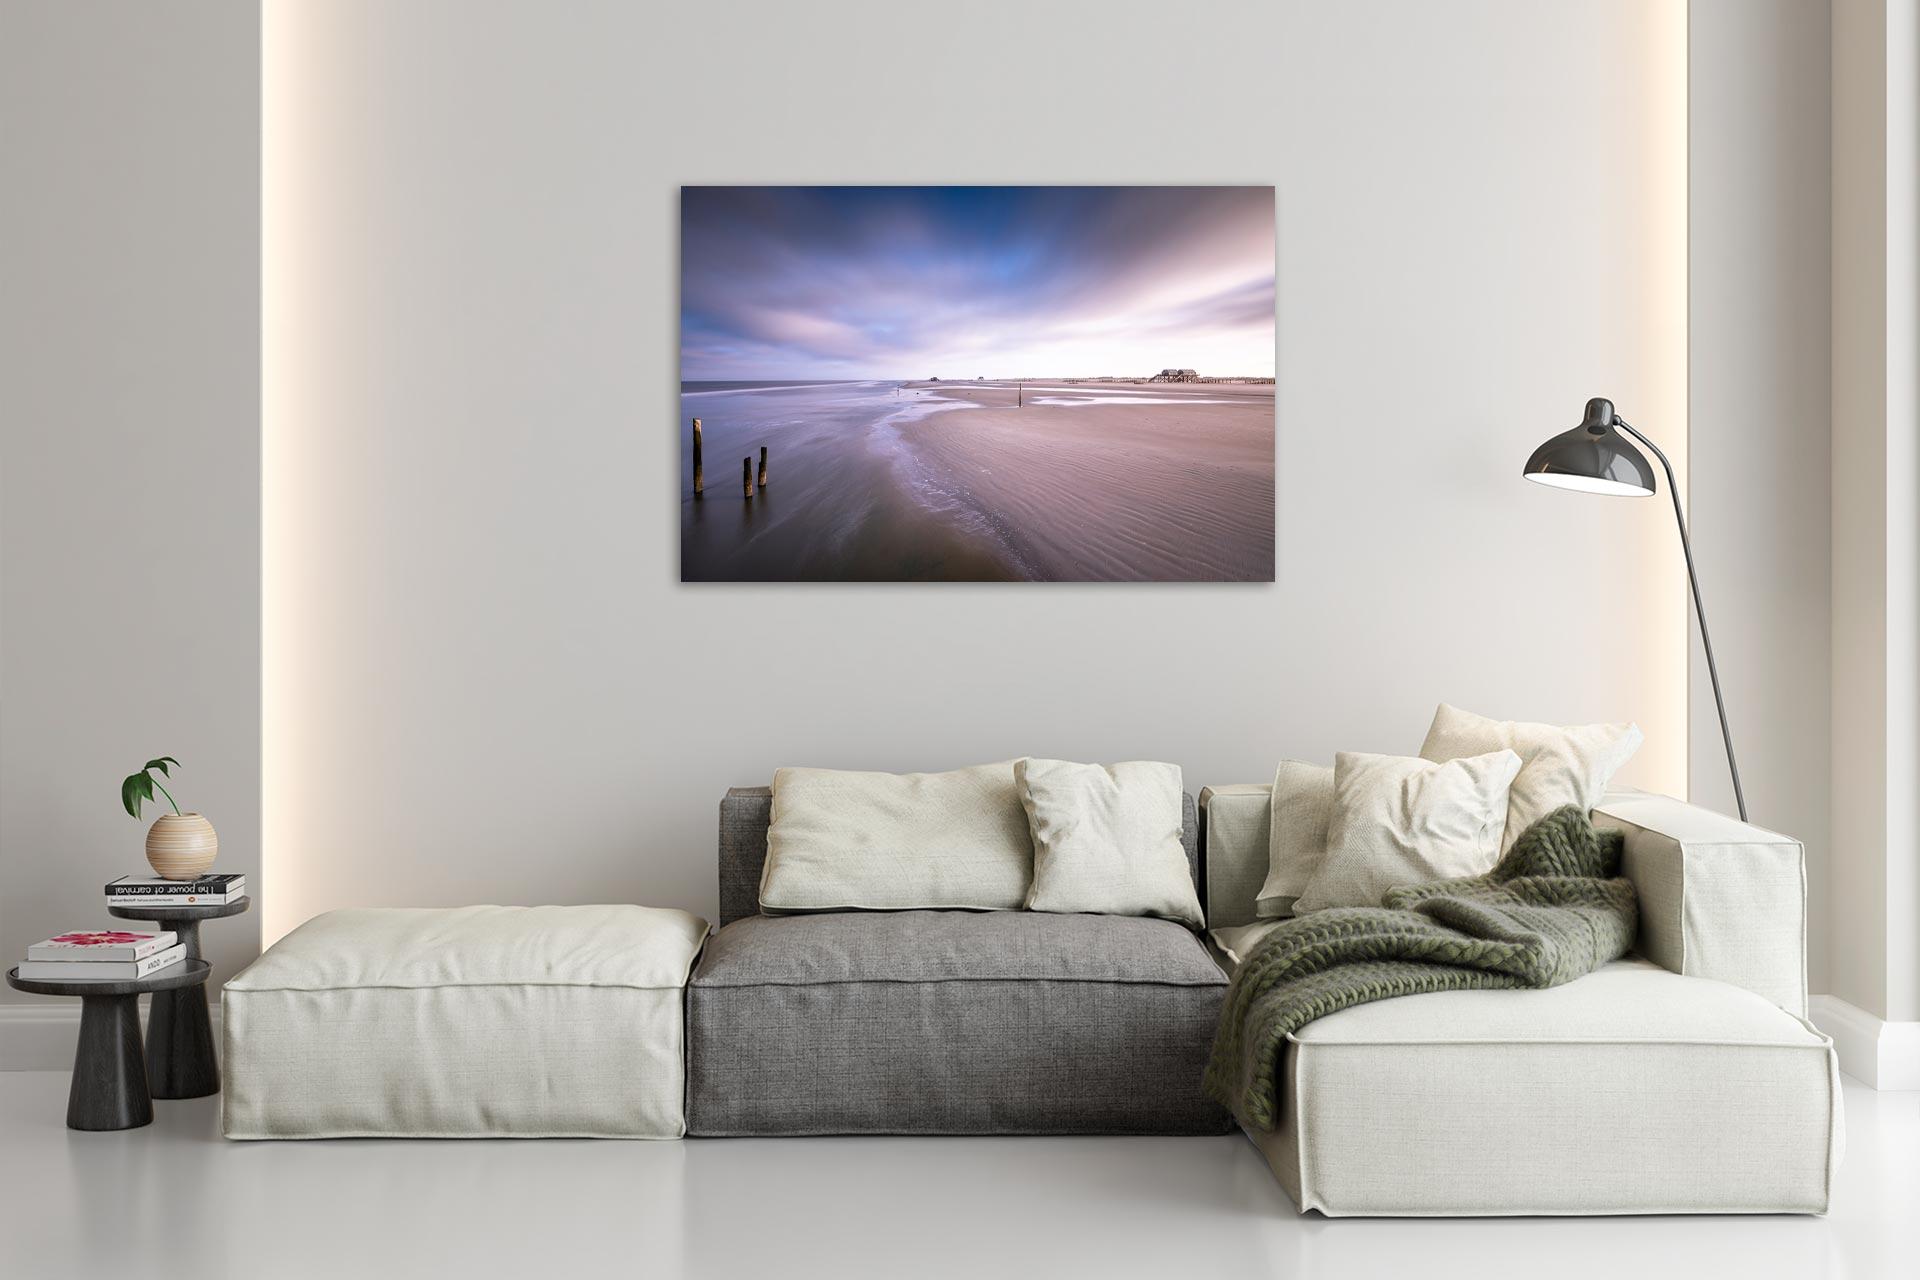 JS205-spo-1-bild-auf-leinwand-acrylglas-aludibond-wohnzimmer